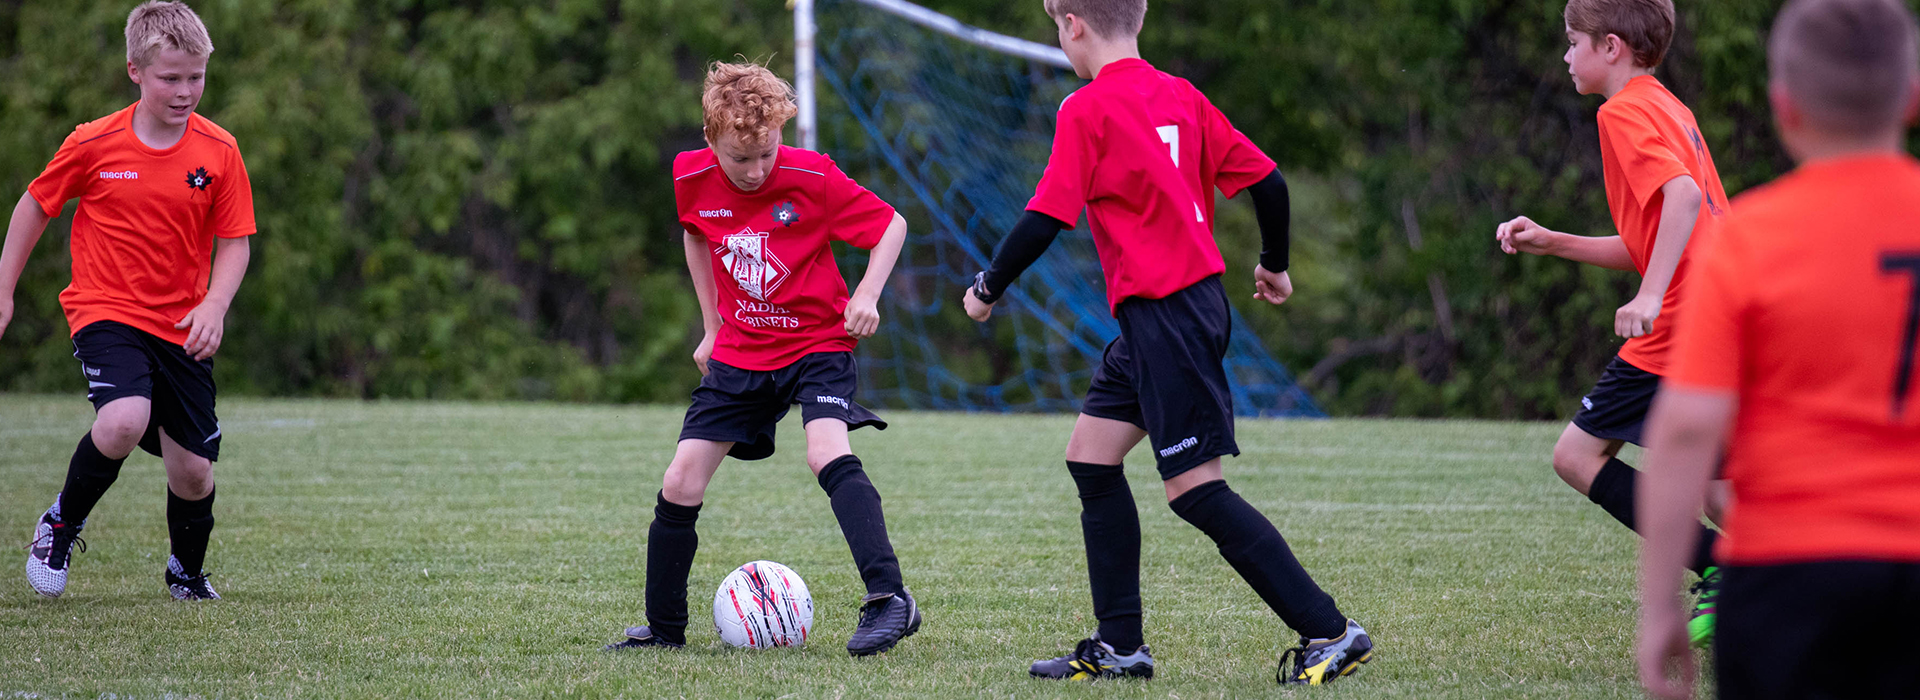 MLCFC HL U12 Boys Division